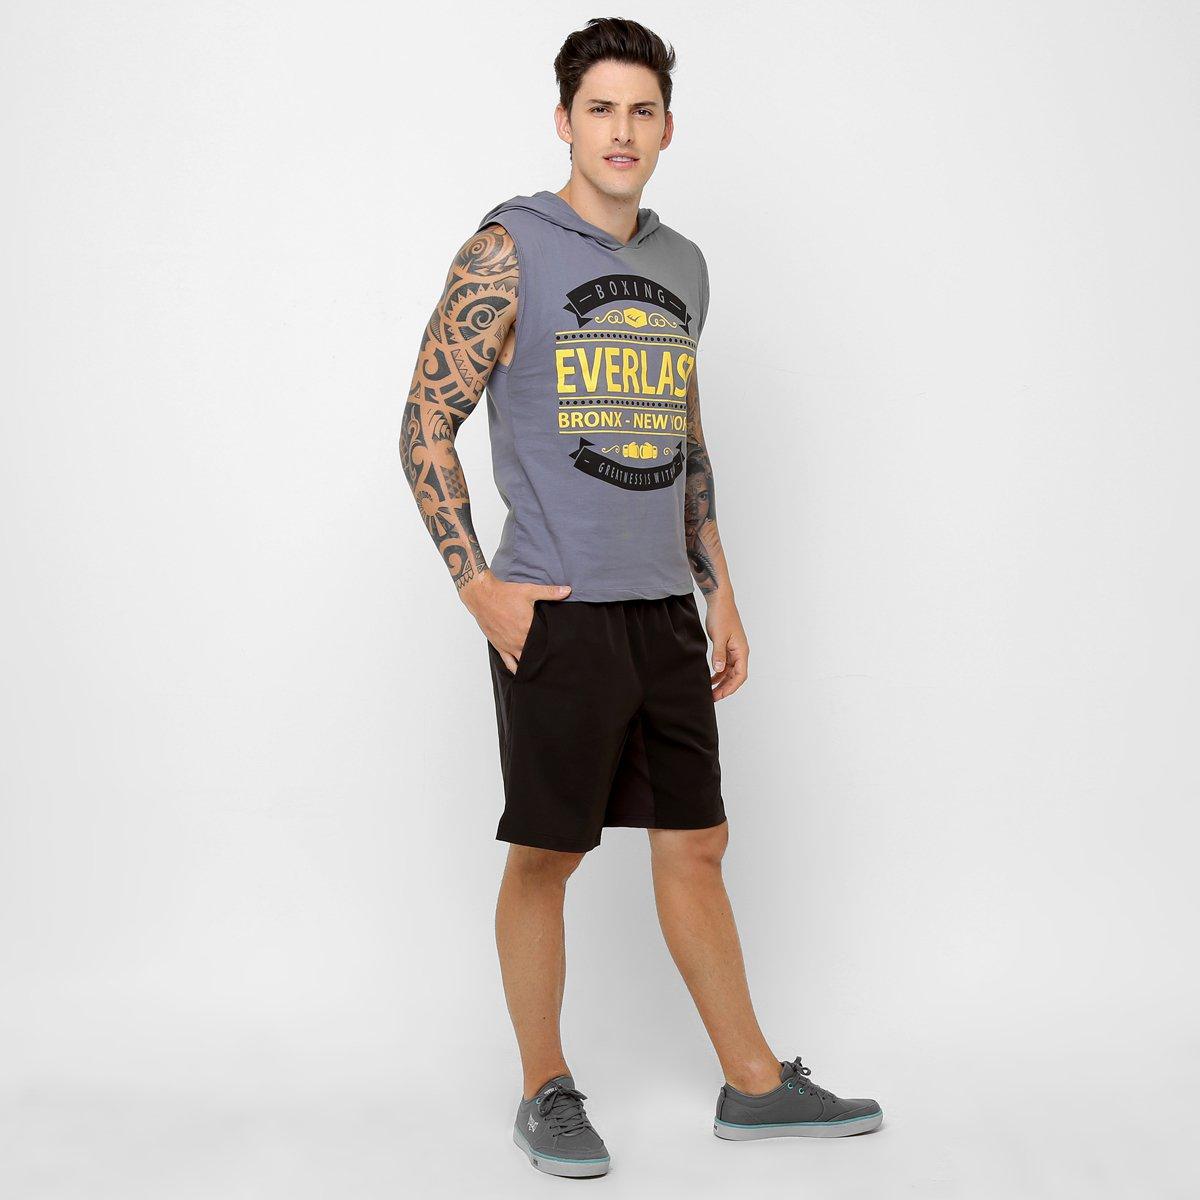 Camiseta Regata Everlast c  Capuz - Compre Agora  f8be64bf112